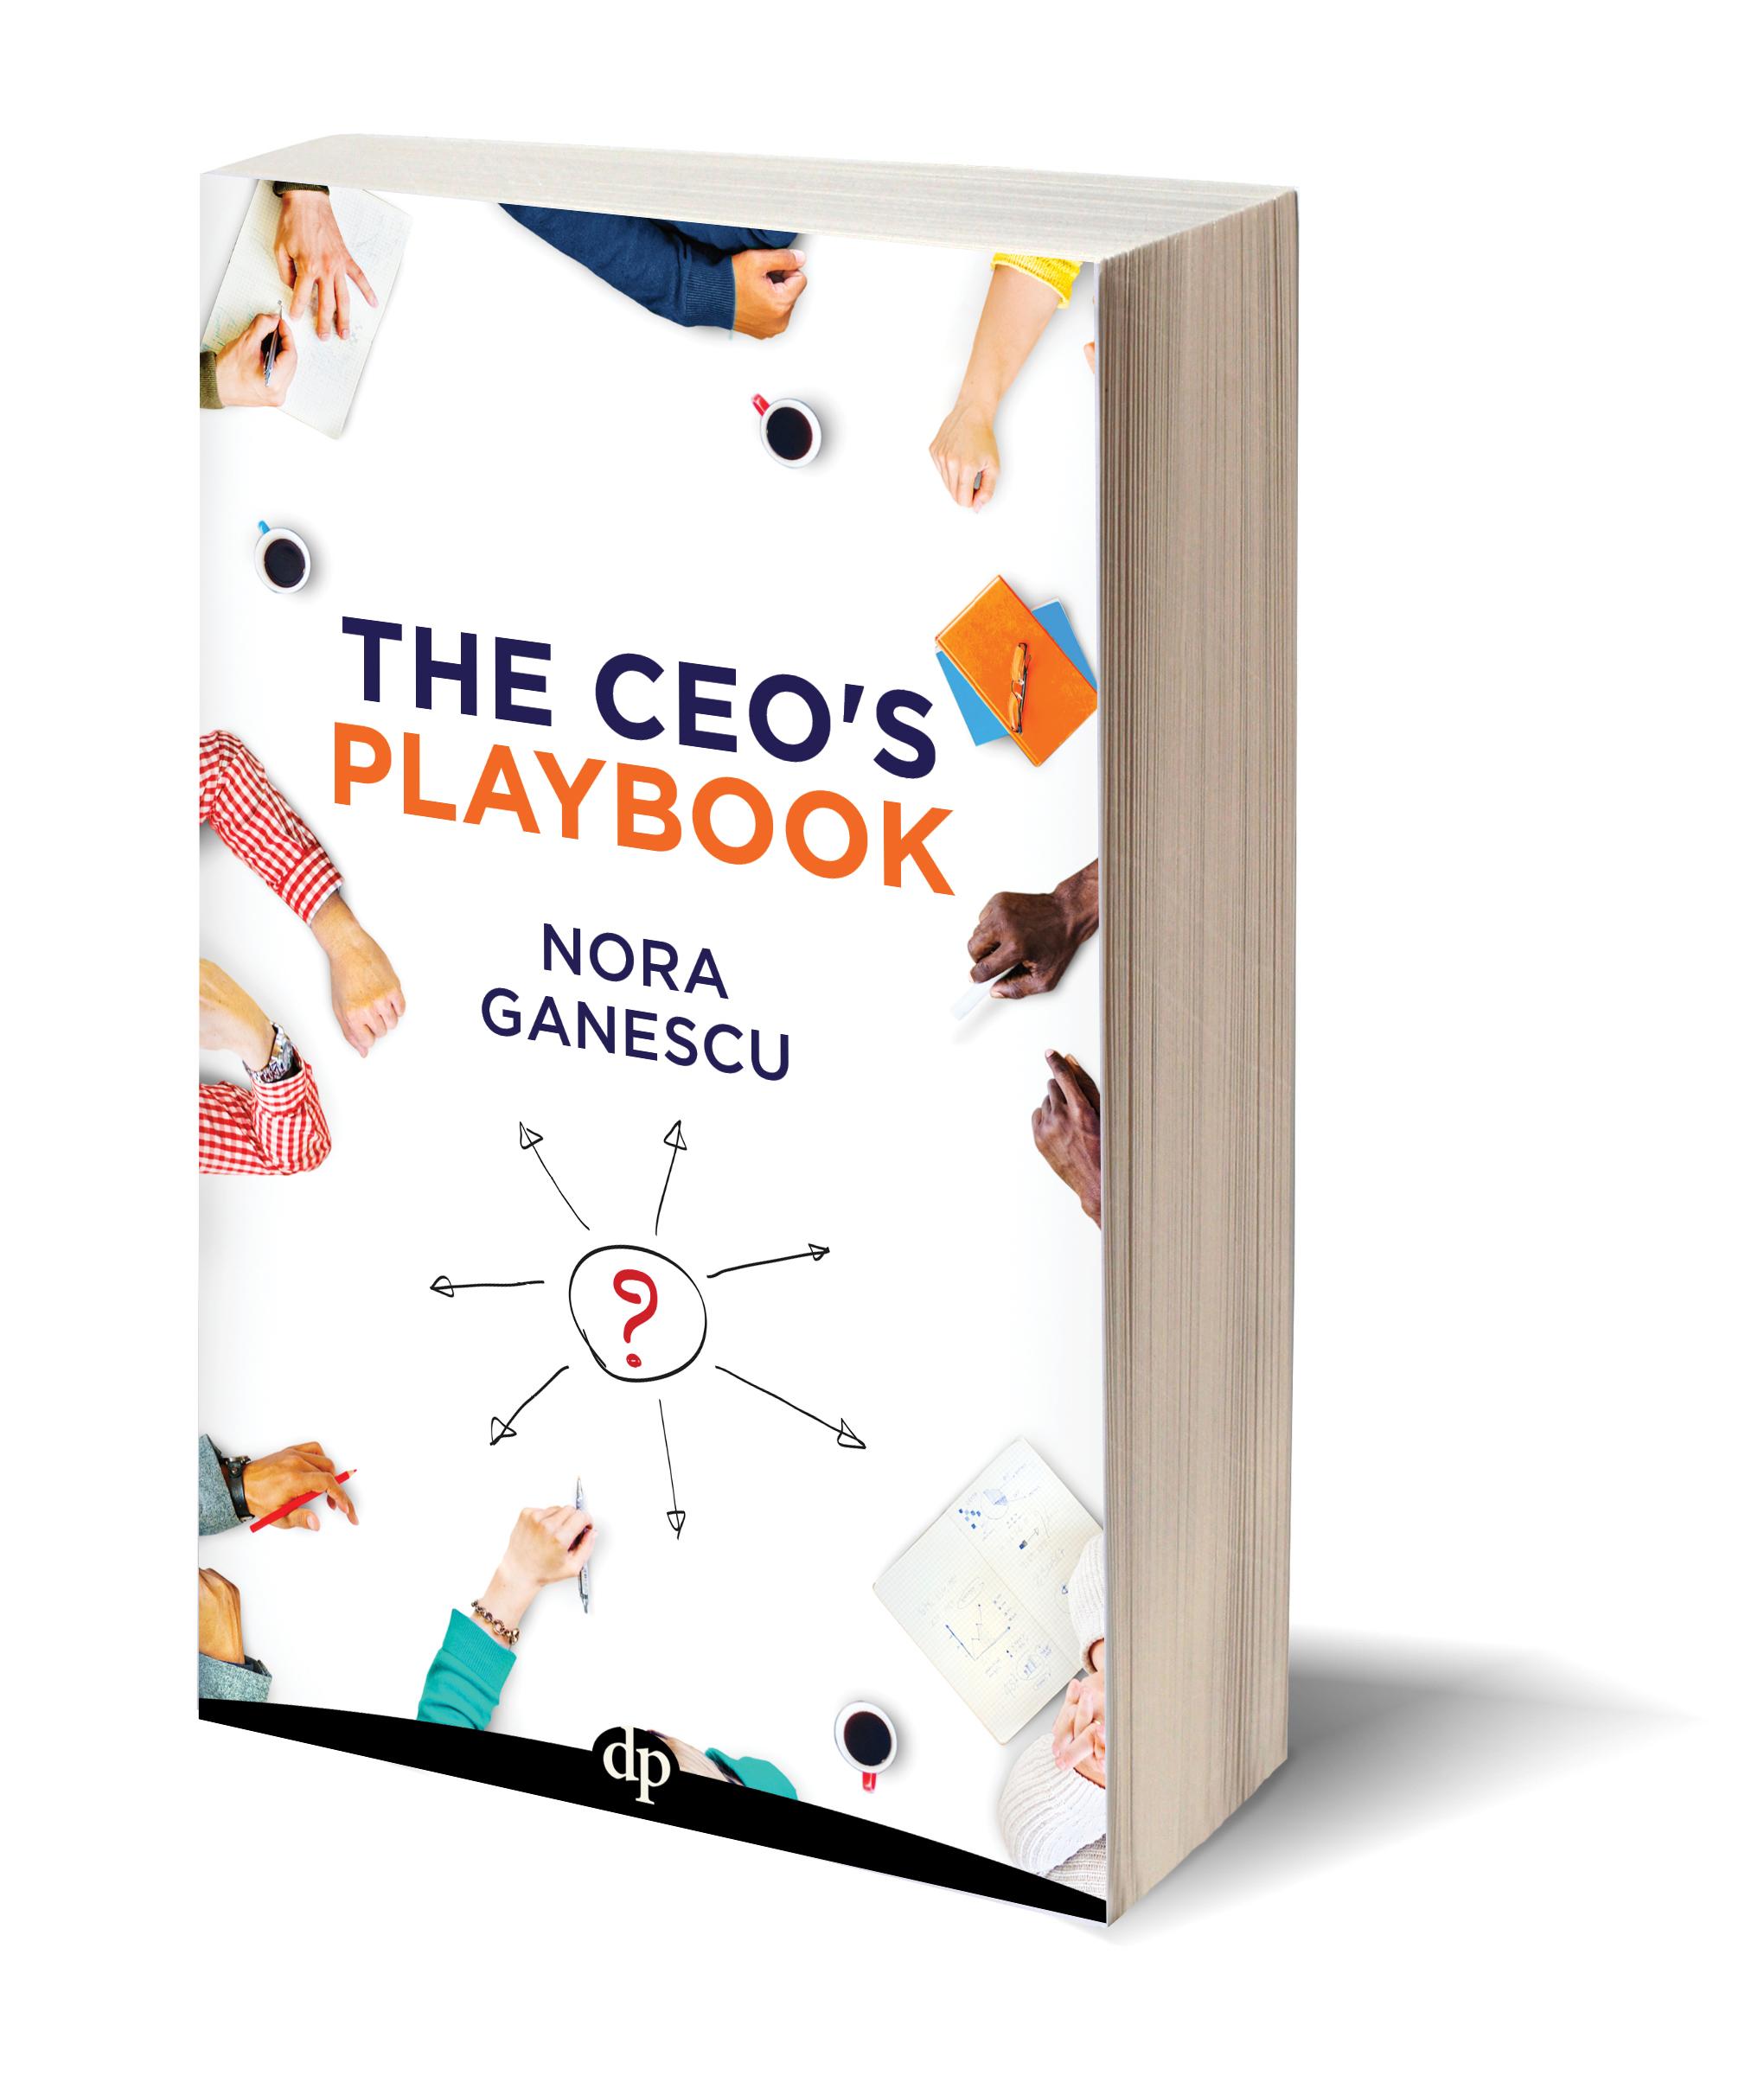 Ganescu-1-CEOPlaybook-Ebk-Cover-FINAL-3D.jpg